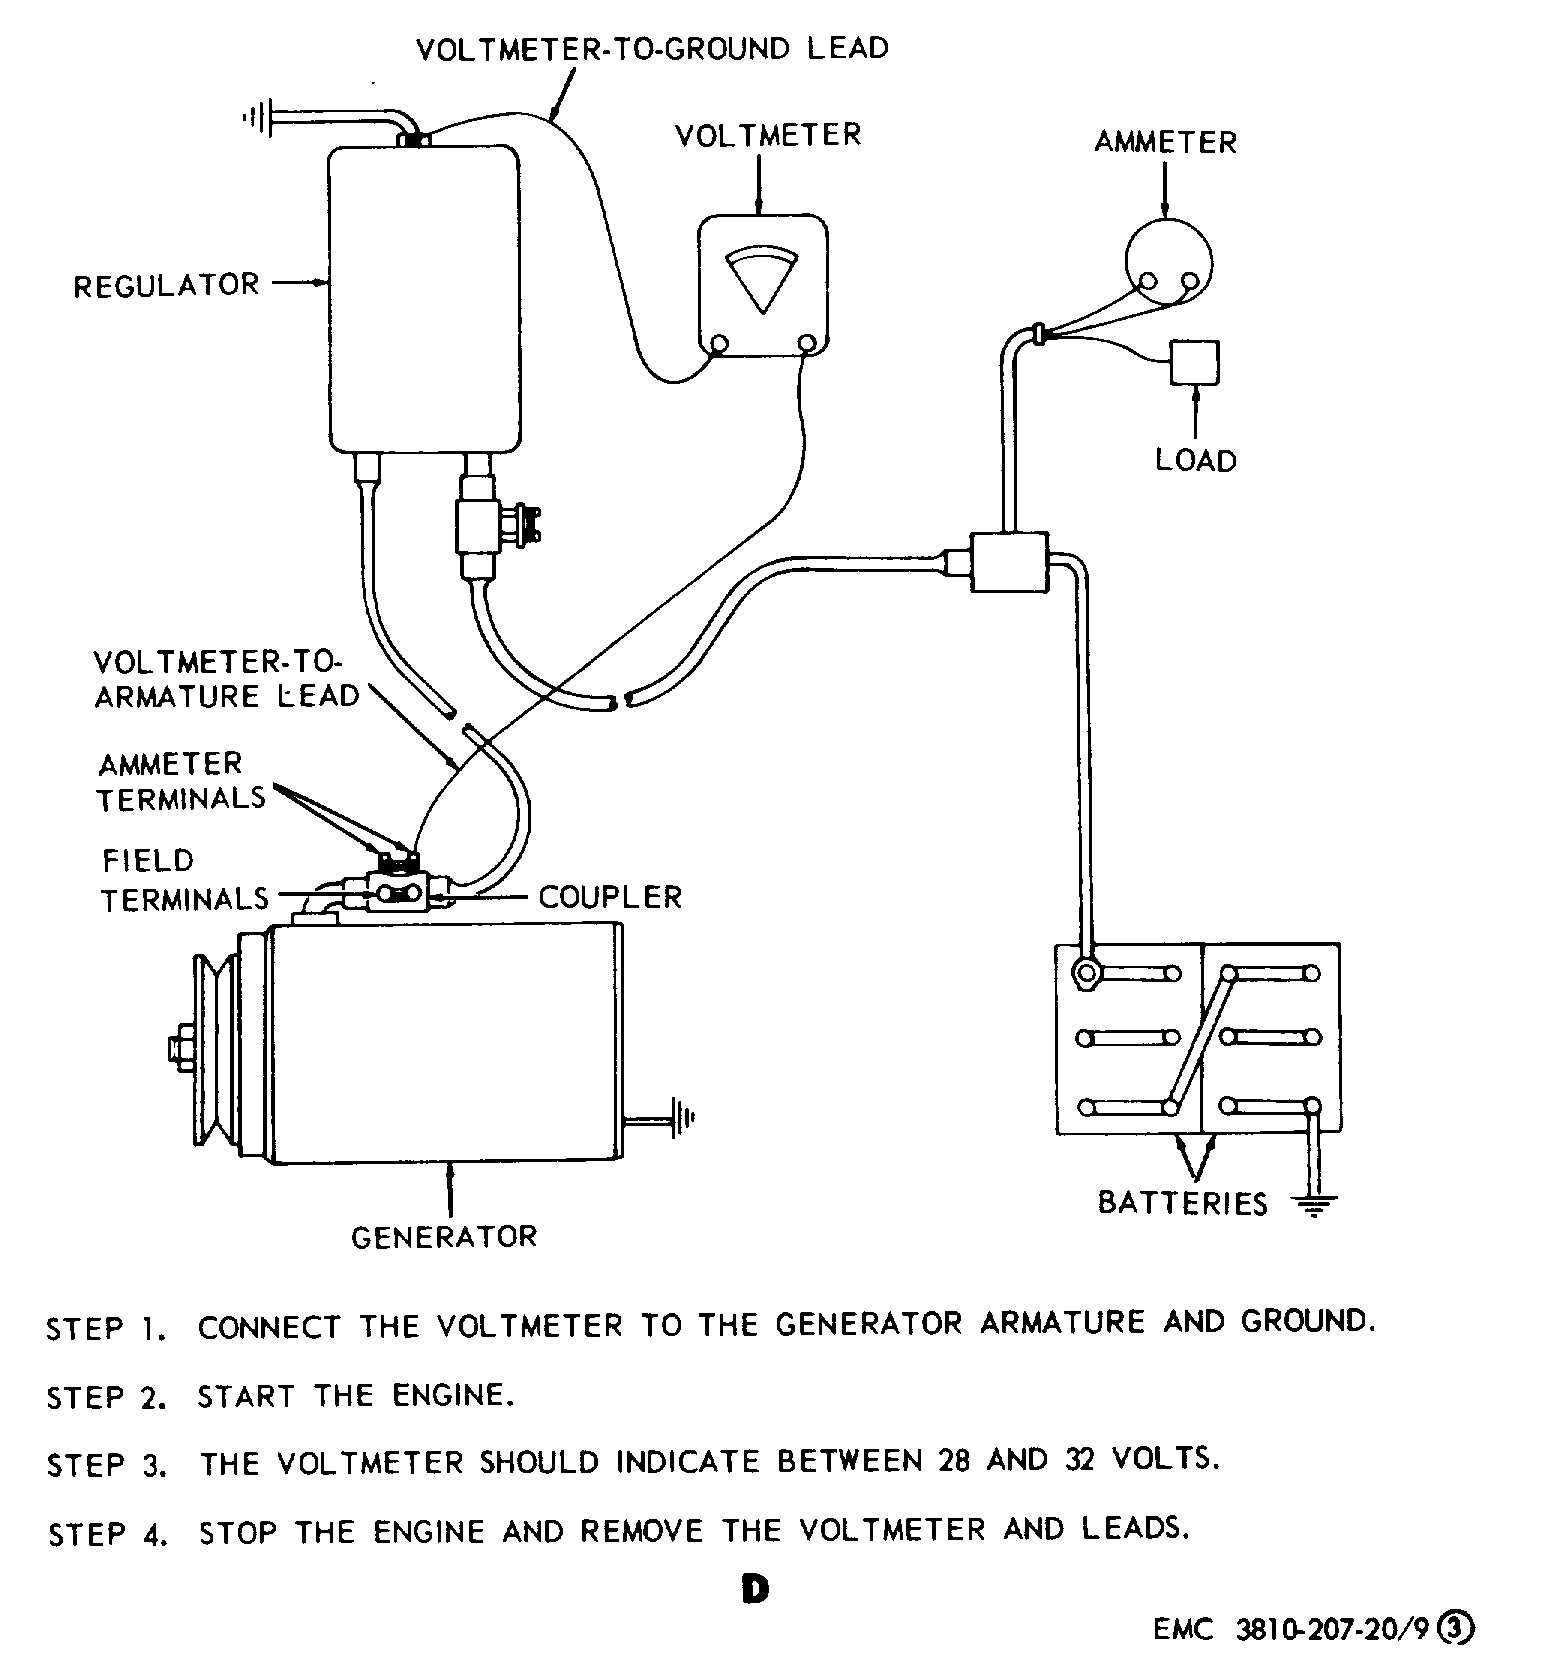 12 Volt Generator Voltage Regulator Wiring Diagram   Tractor Gen - 12 Volt Generator Voltage Regulator Wiring Diagram